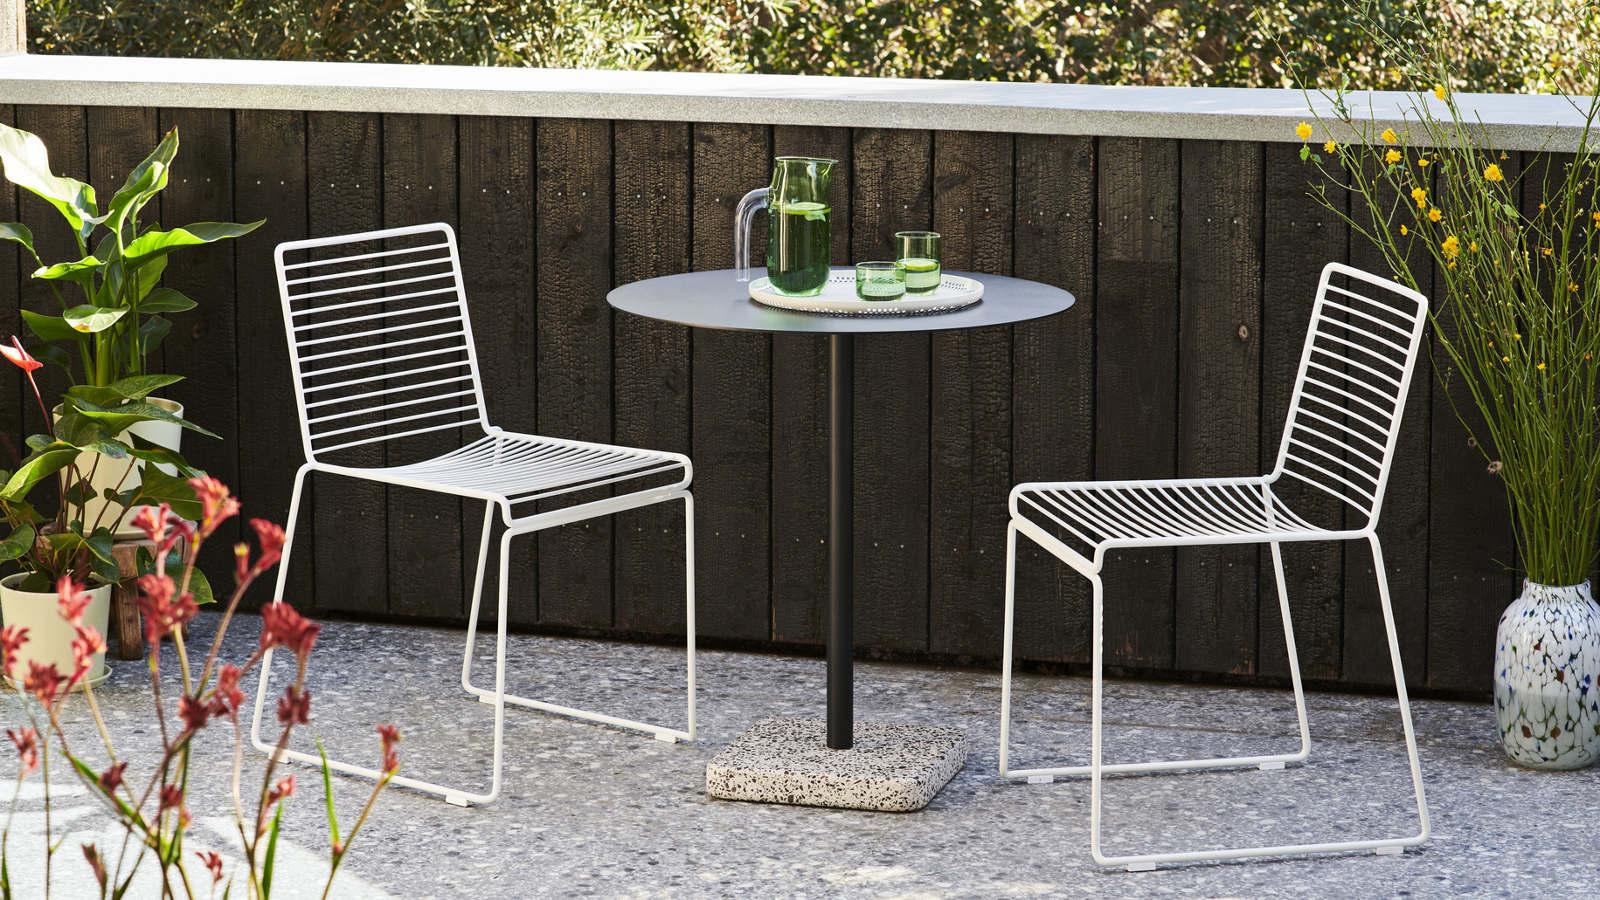 Maison Du Monde Terrazzo terrazzo table top